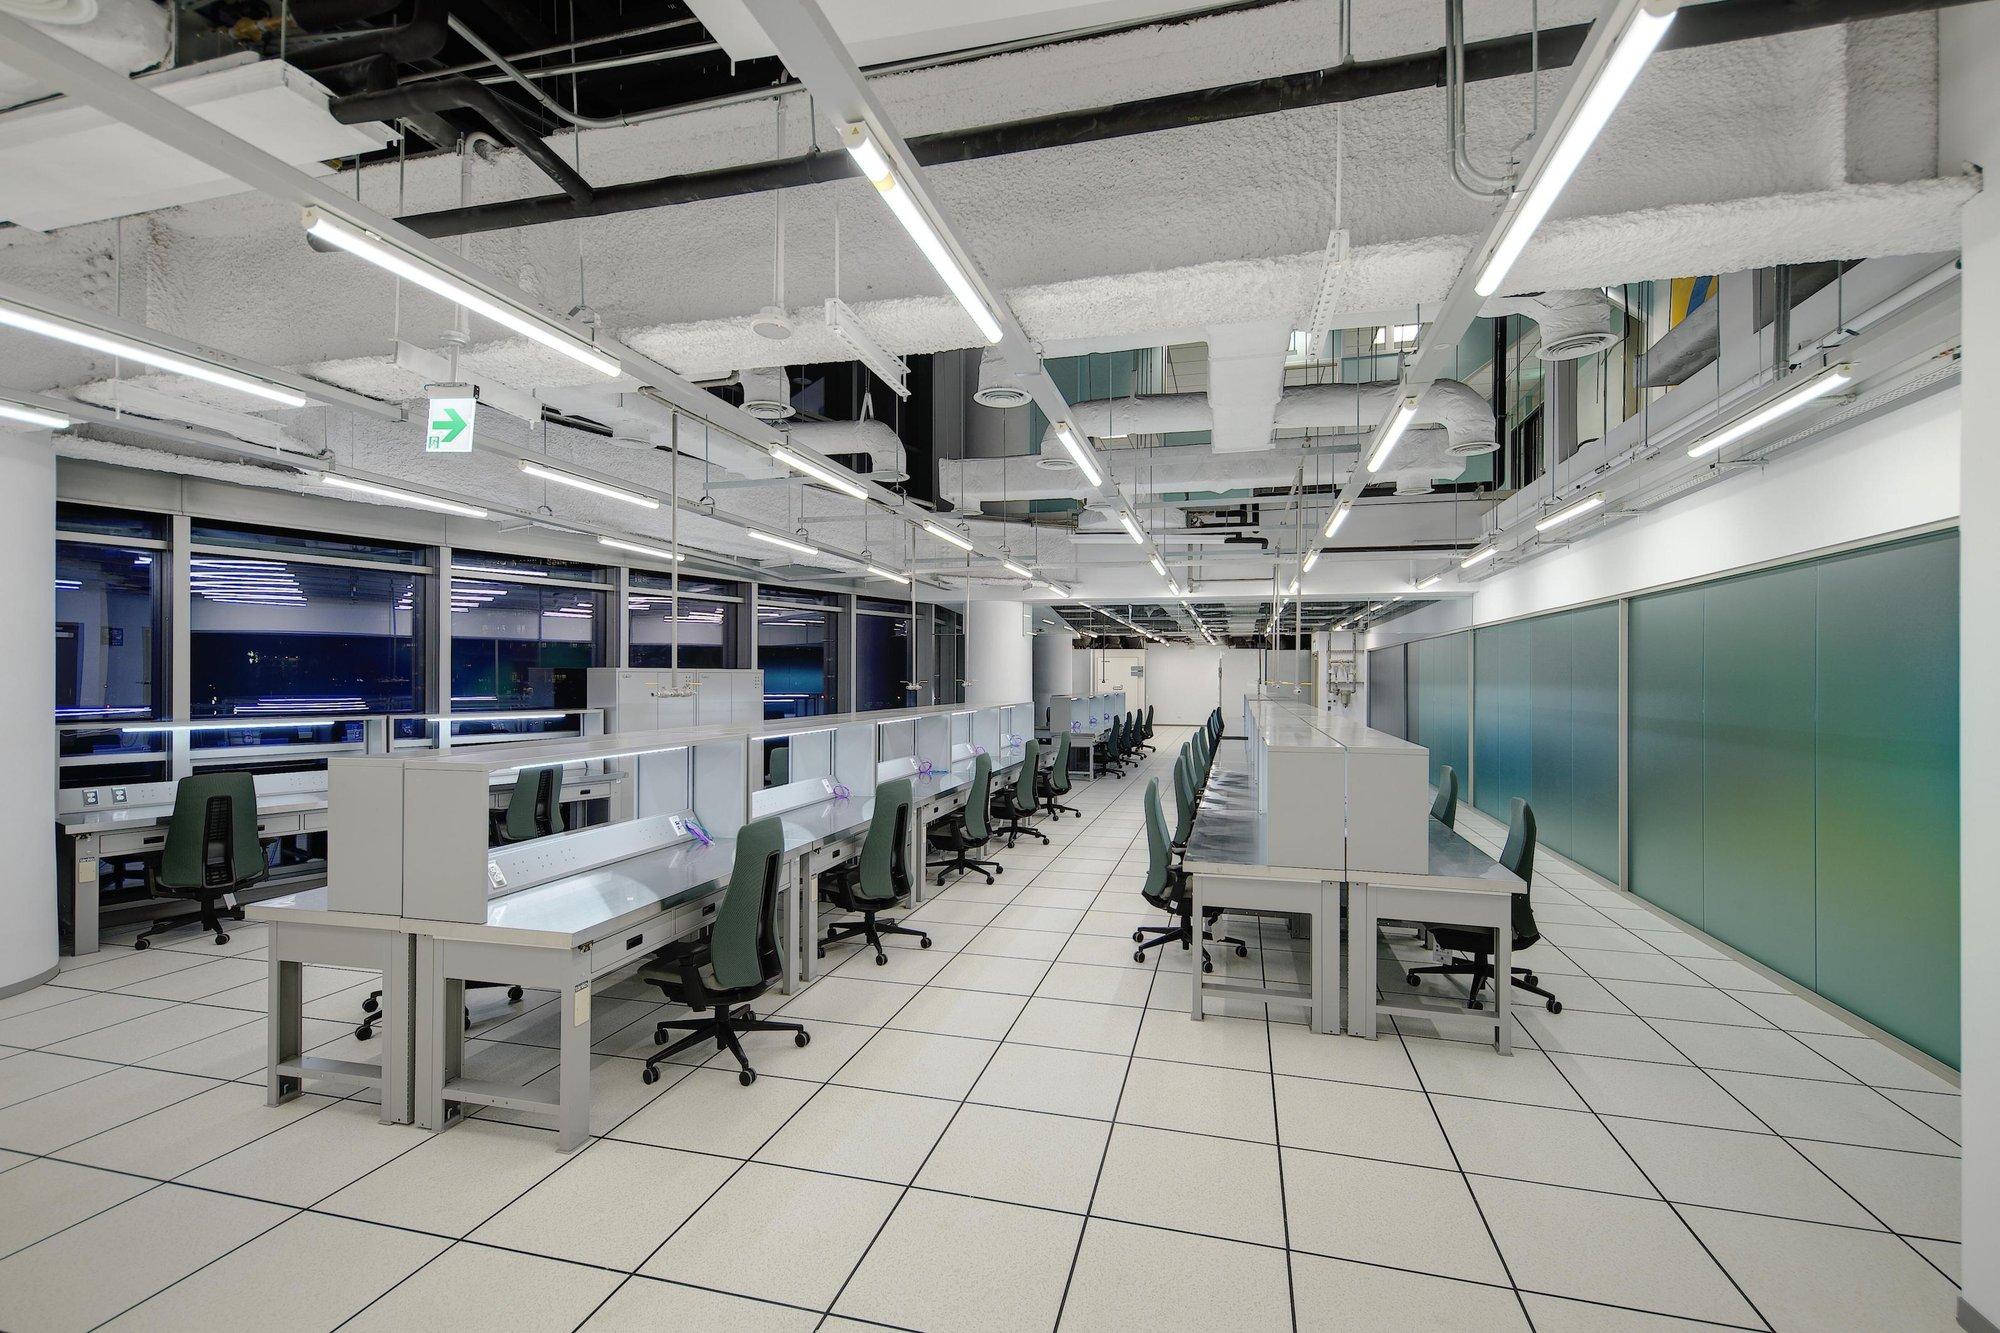 Google Taiwan turns 15 with a new engineering hub